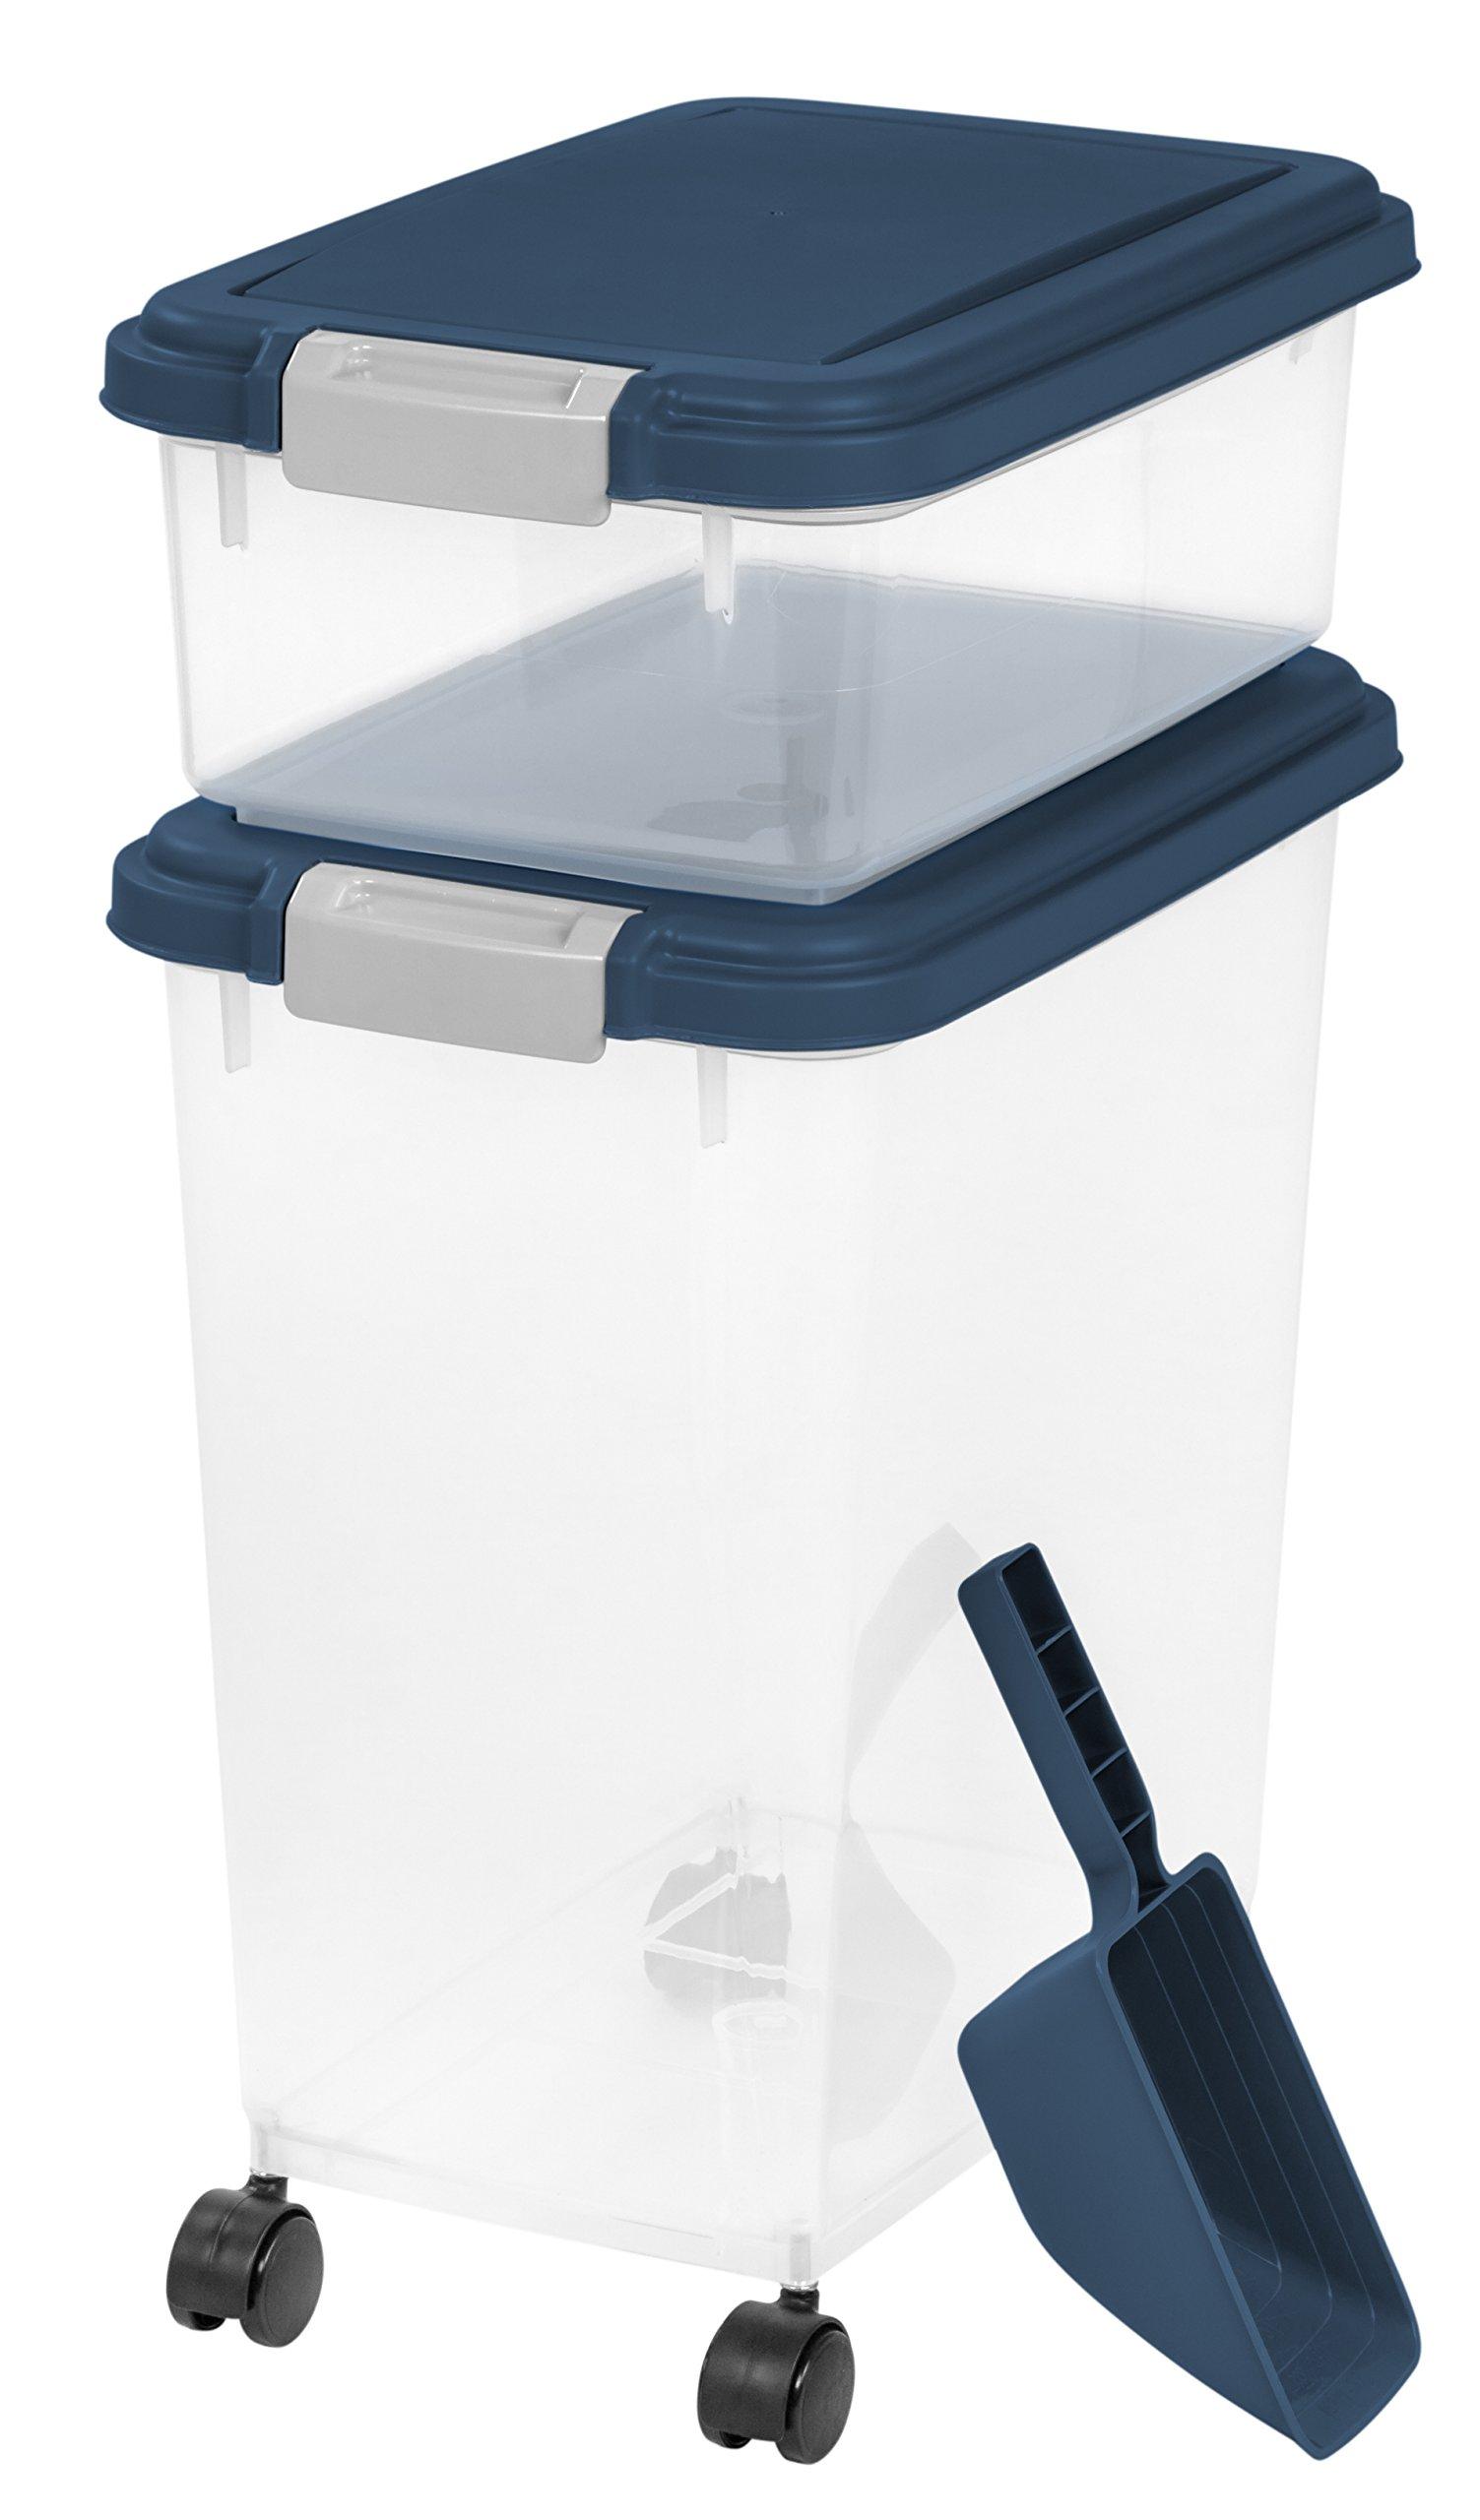 IRIS USA, Inc. 3 Piece Airtight Pet Food Storage Container Combo, Navy Blue by IRIS USA, Inc.